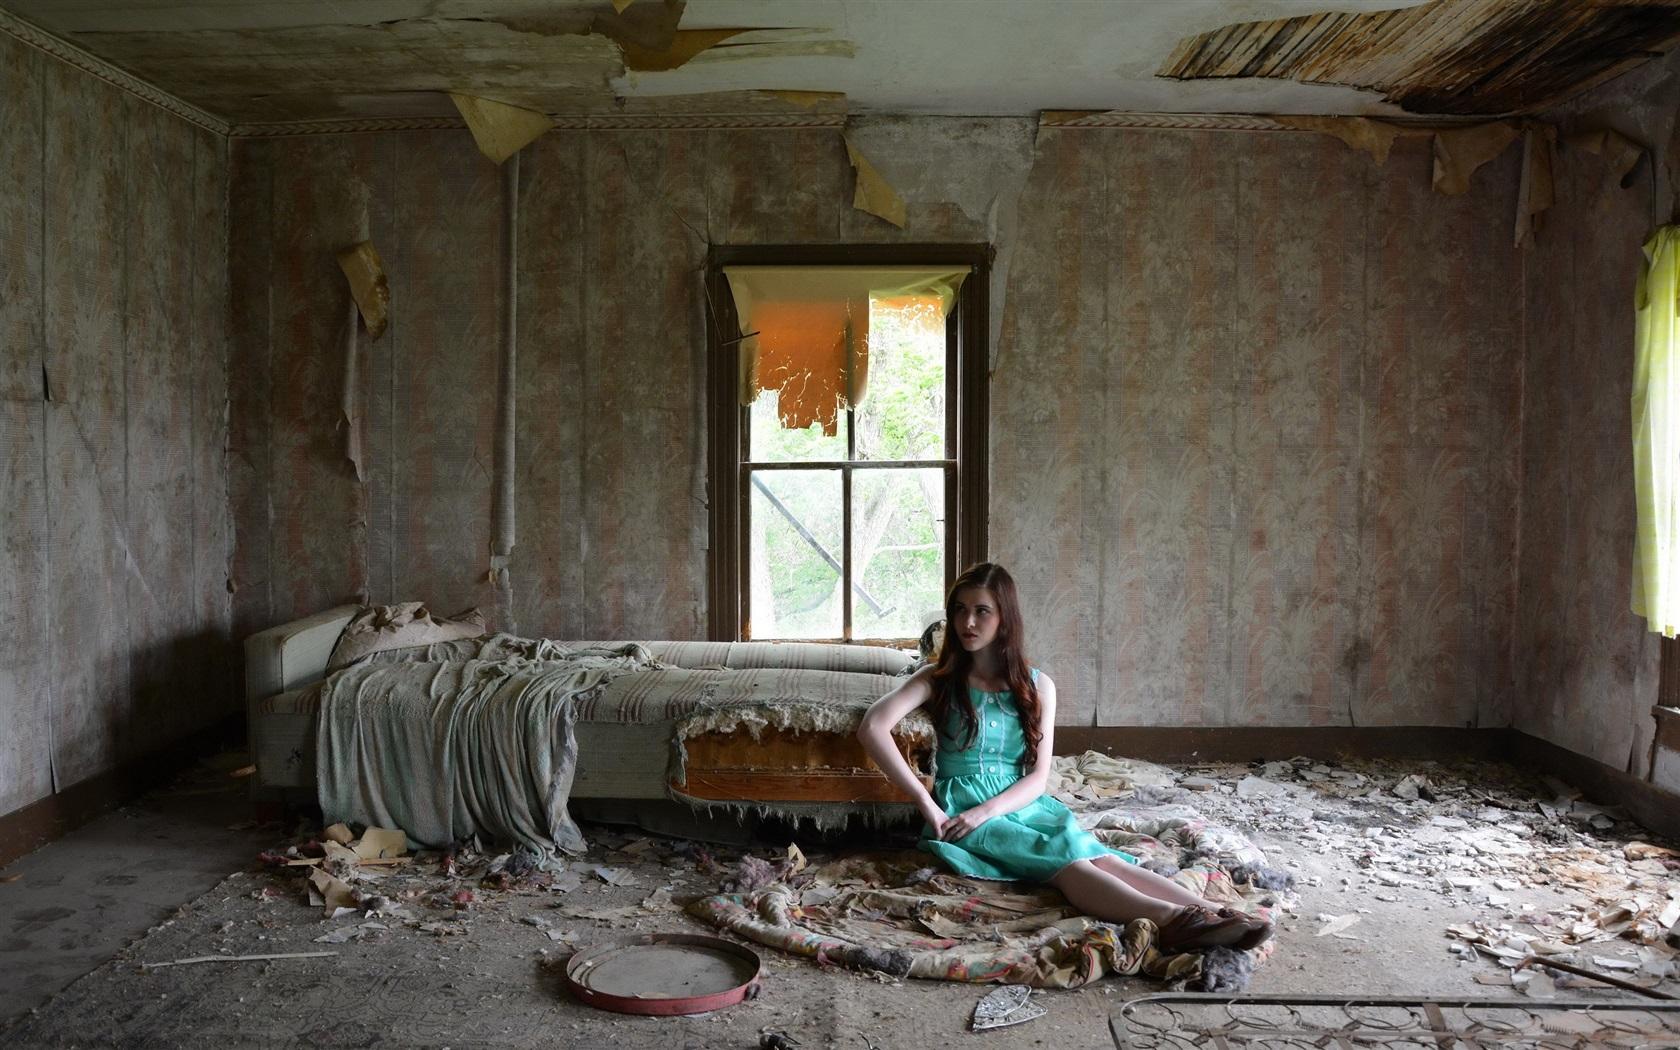 Broken room interior blue dress girl wallpaper for Best room wallpaper